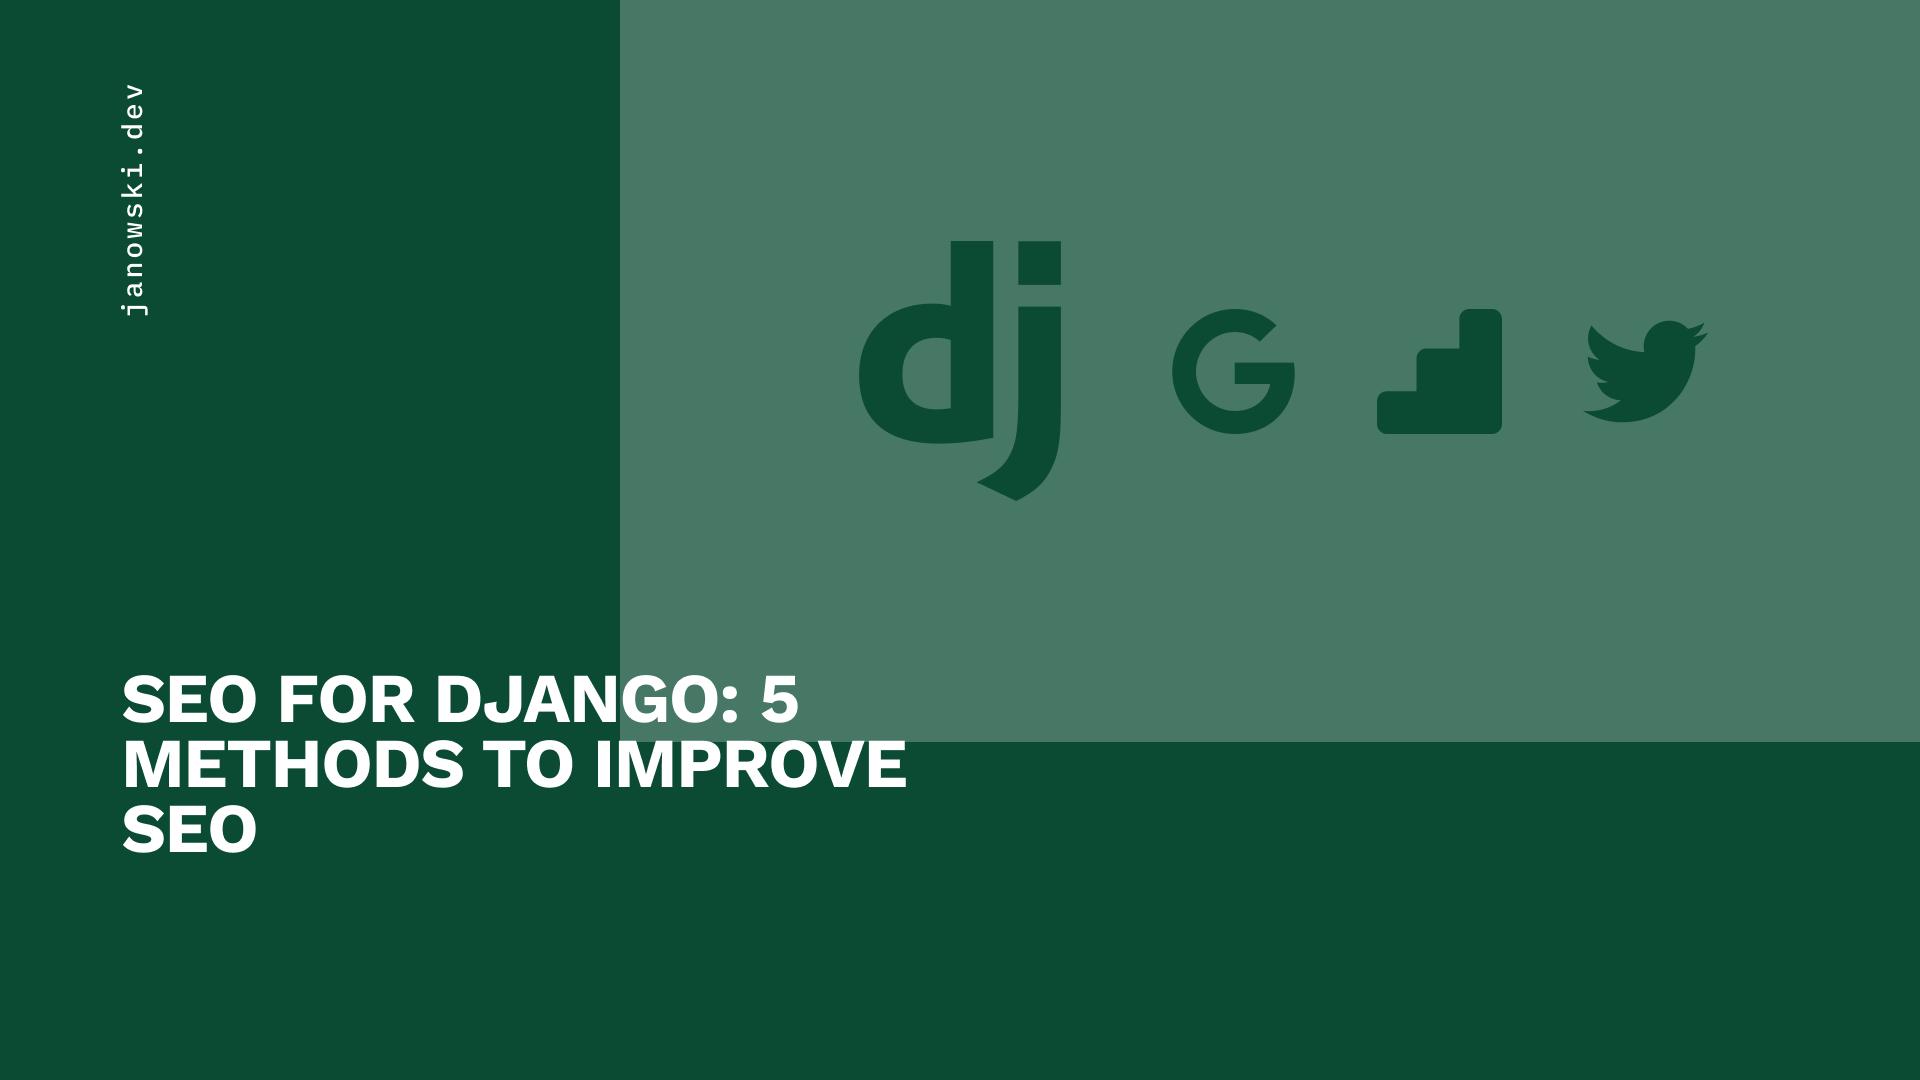 SEO for Django: 5 Methods to Improve SEO